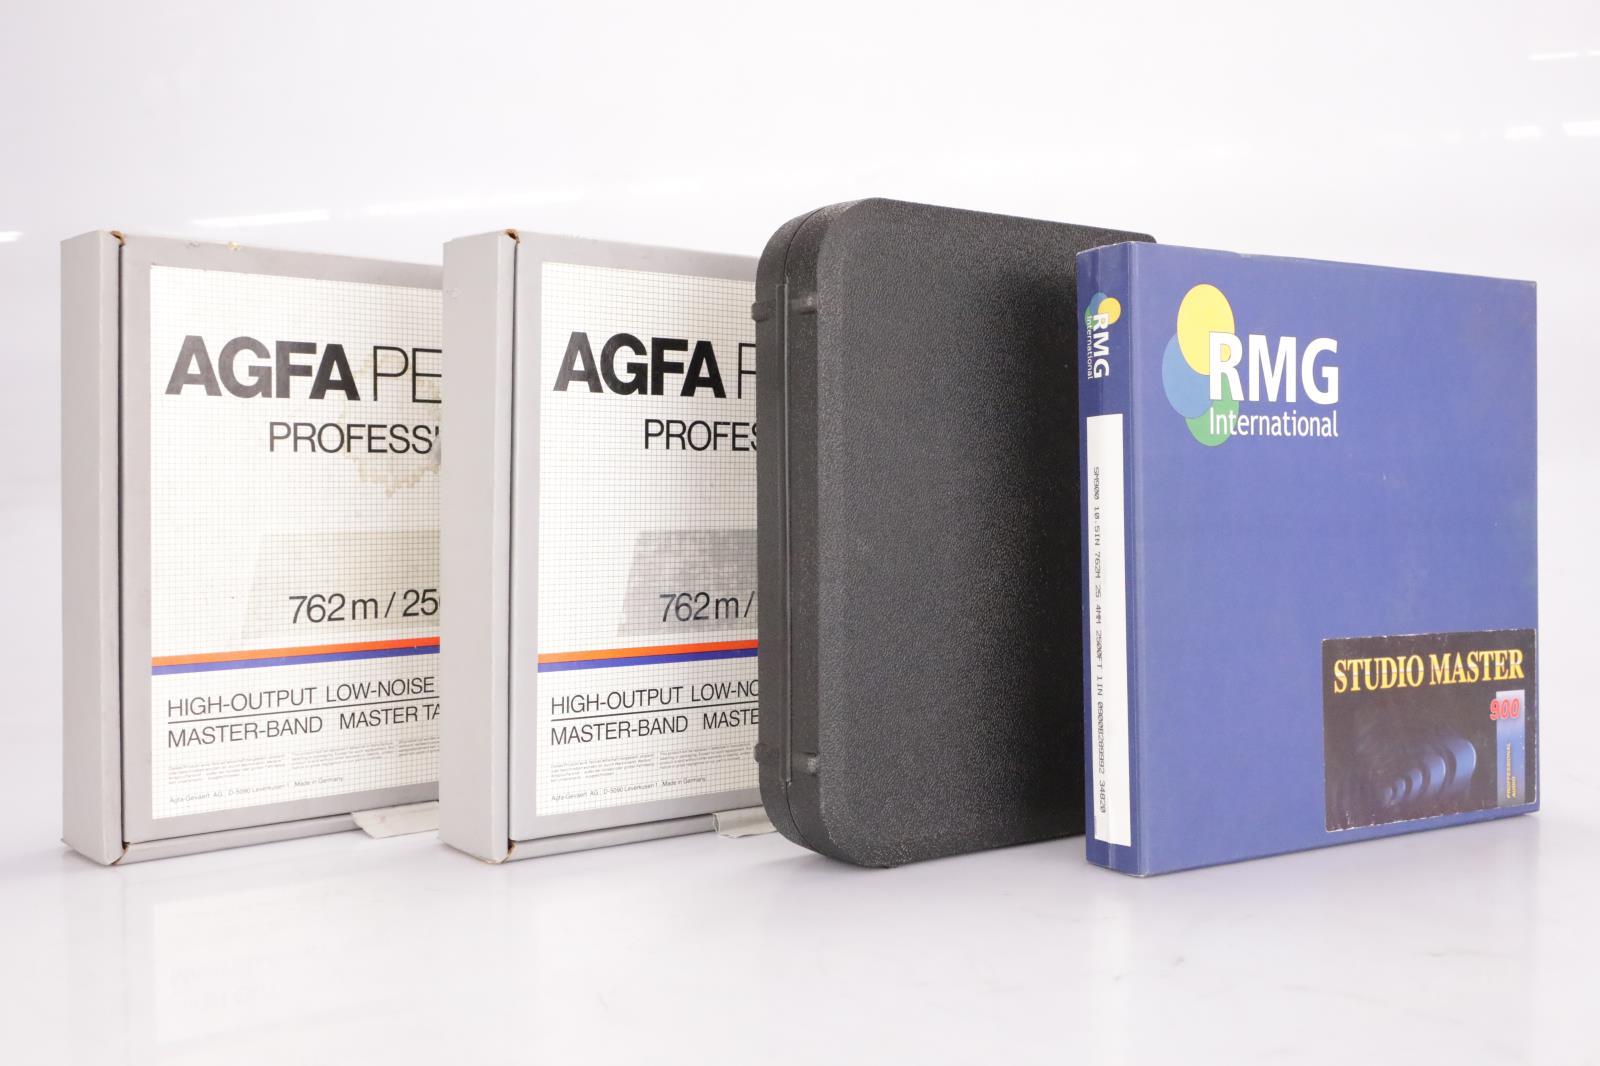 "2 AGFA PEM 469 2"" x 2500' Analogue Tape Reels & RMG Studio Master 900 1"" #37246"